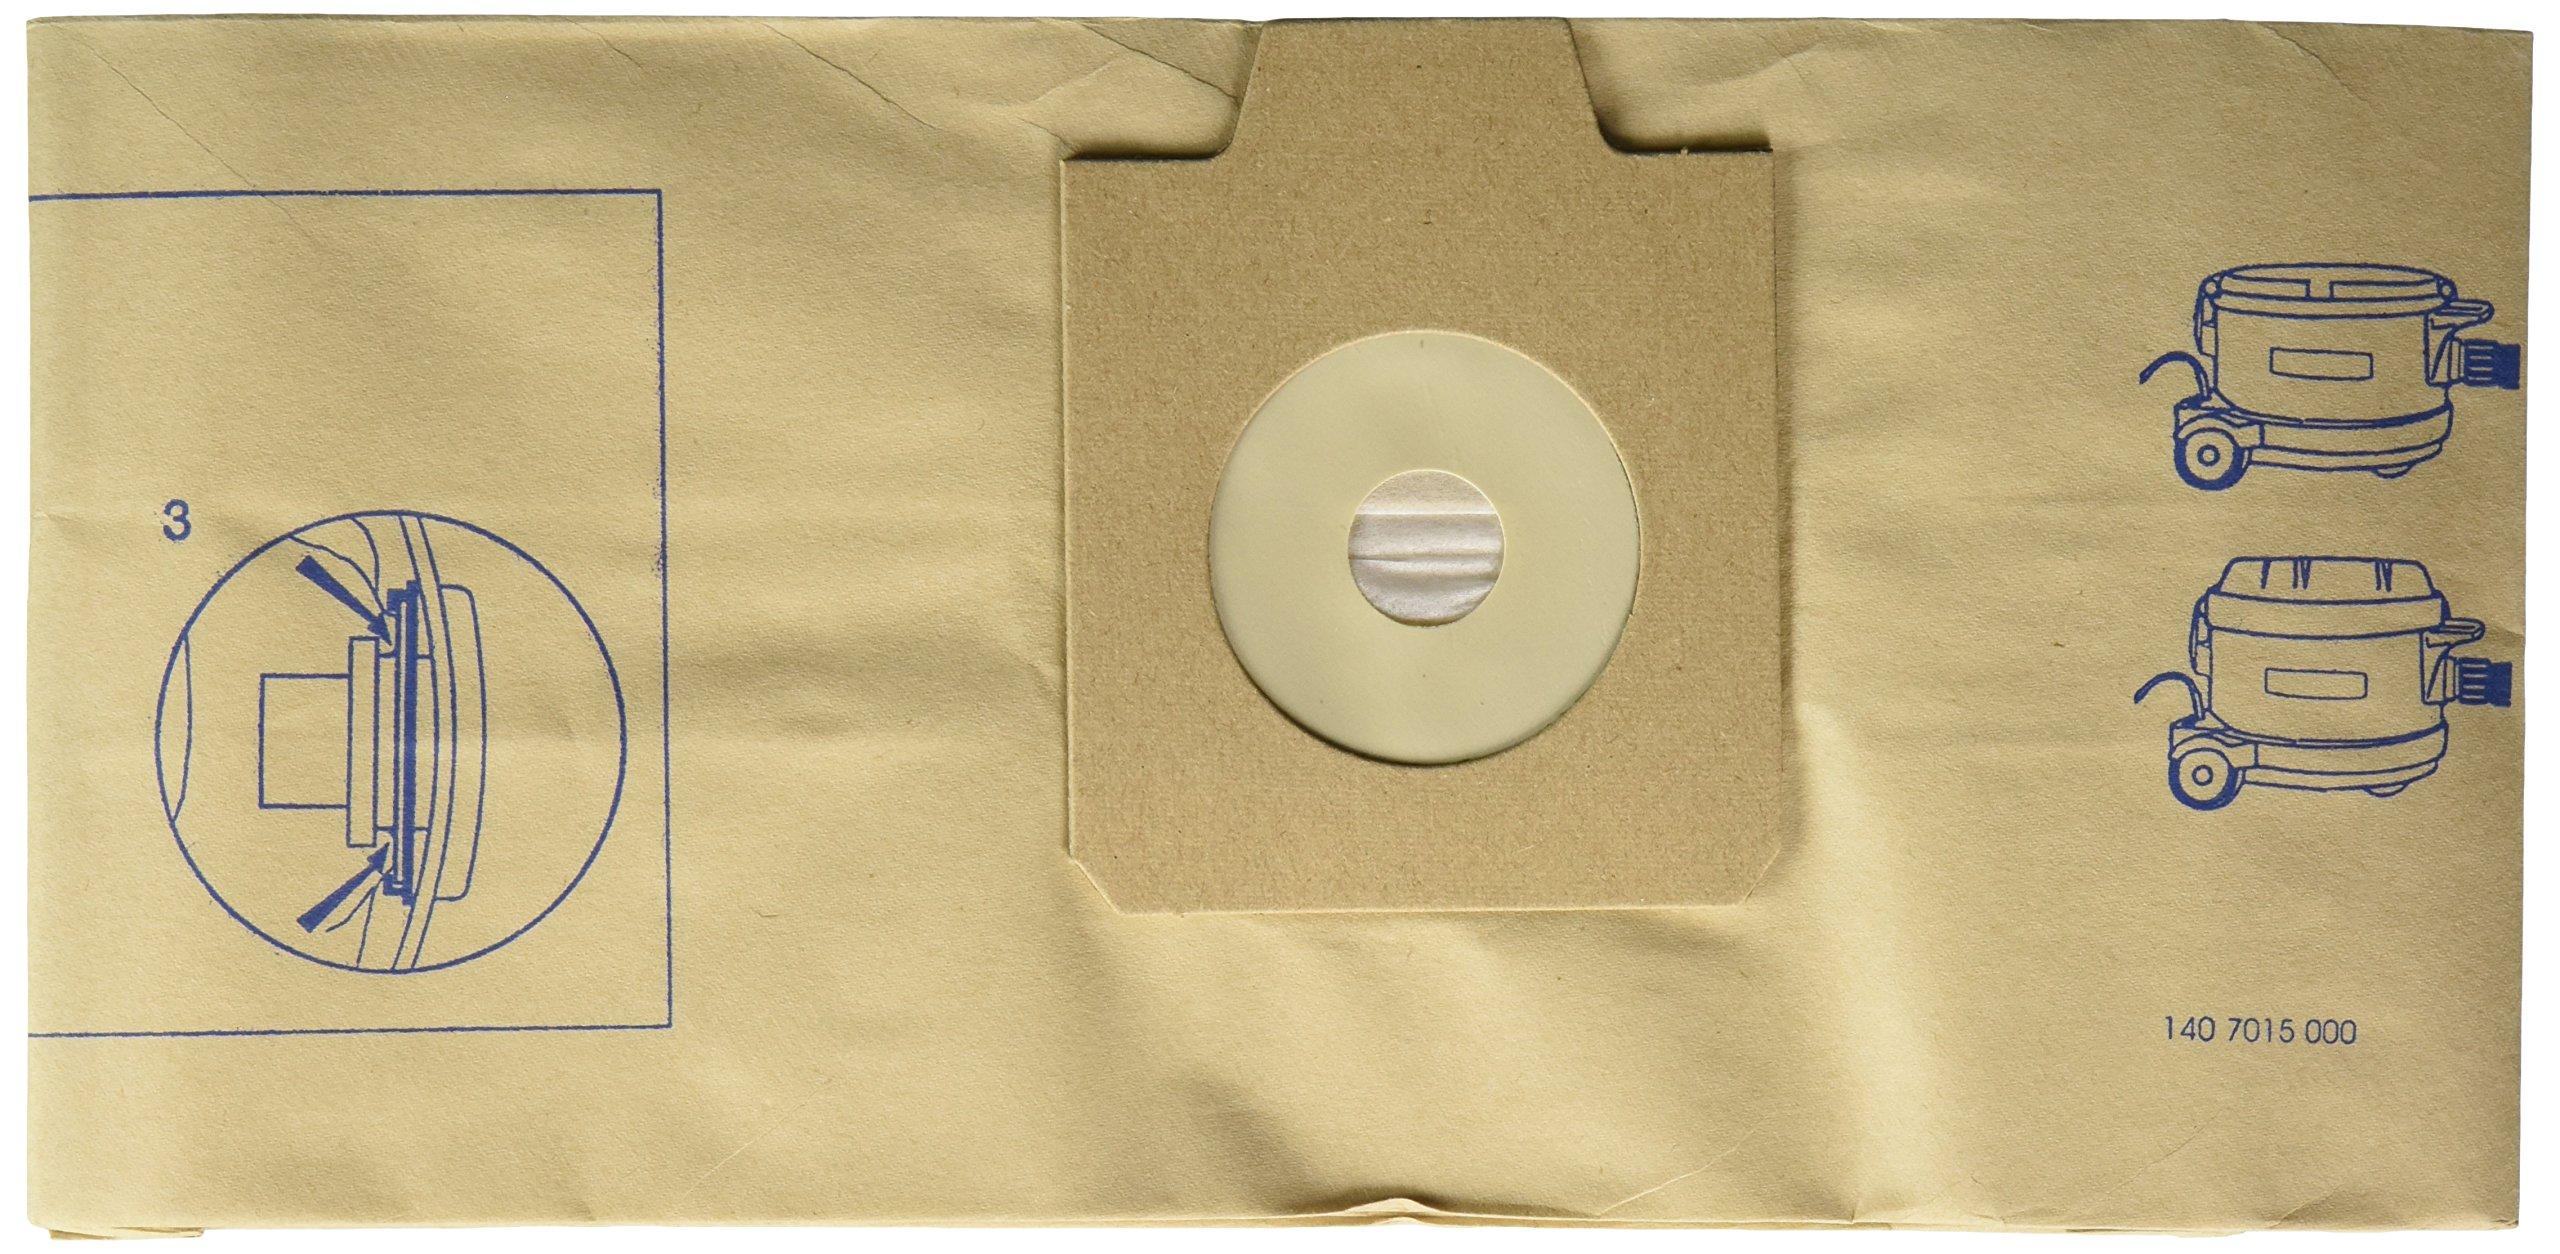 Nilfisk Gd930 Dp9000 Vacuum Filter Bags 5pk 1407015020